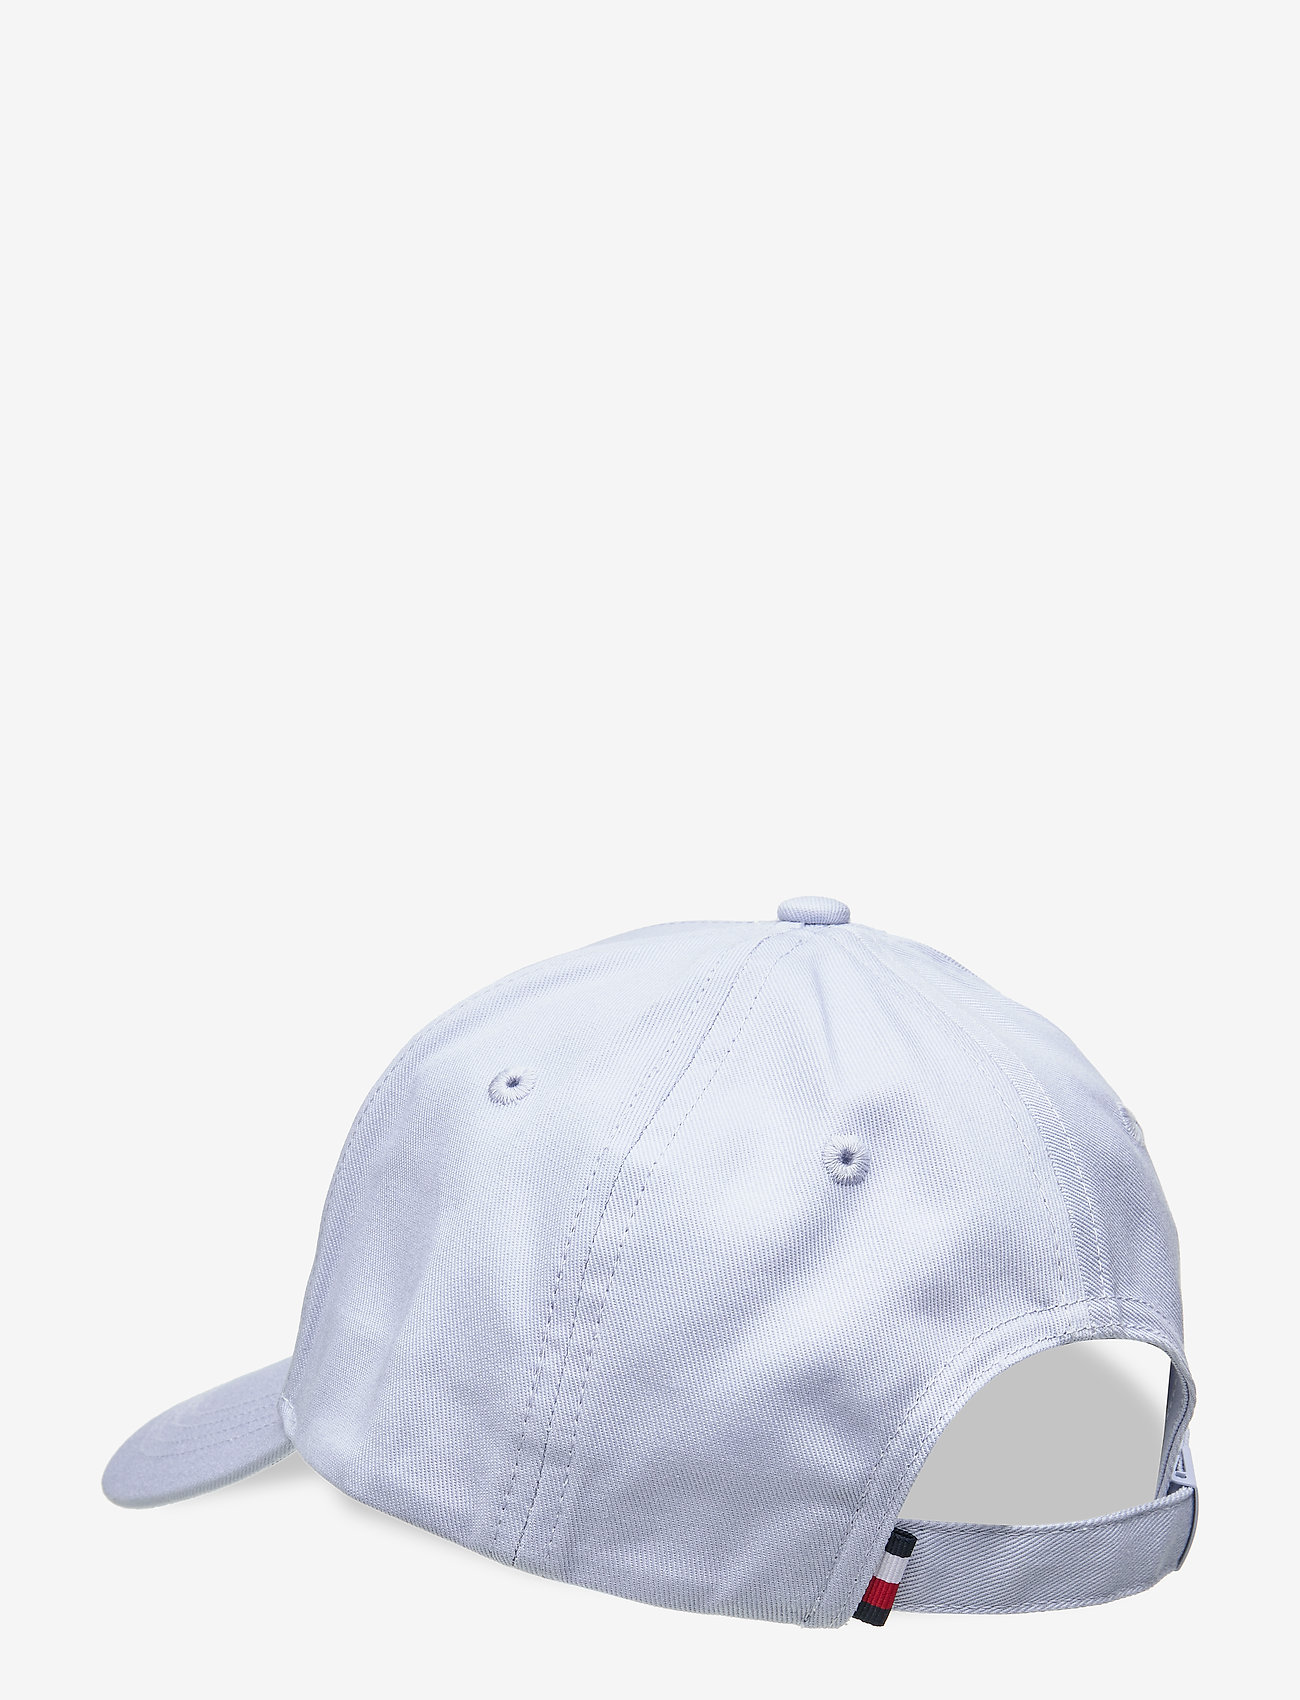 Tommy Hilfiger - TH CHIC CAP - casquettes - breezy blue - 1